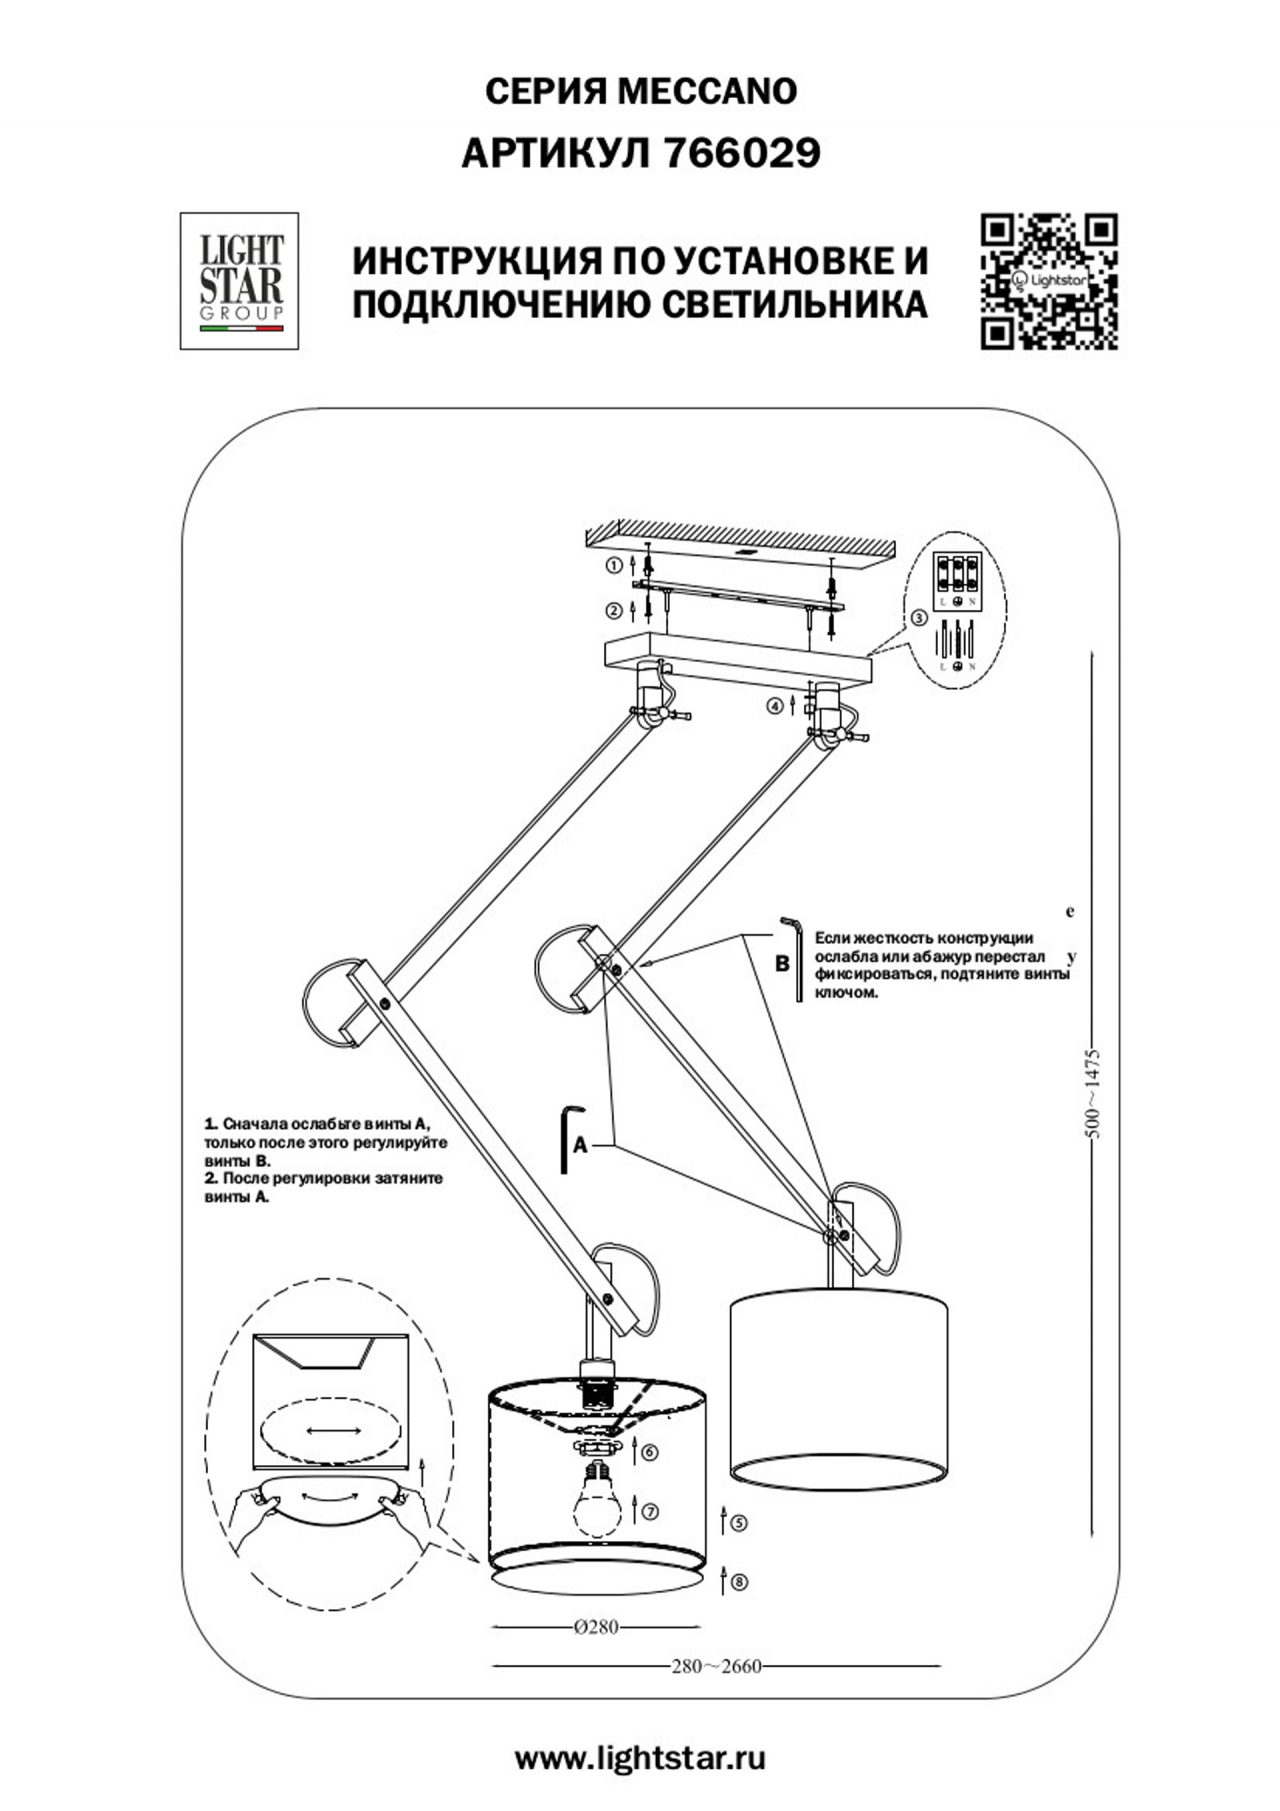 Люстра потолочная MECCANO 2х60W E27 хром / белый ткань Lightstar 766029